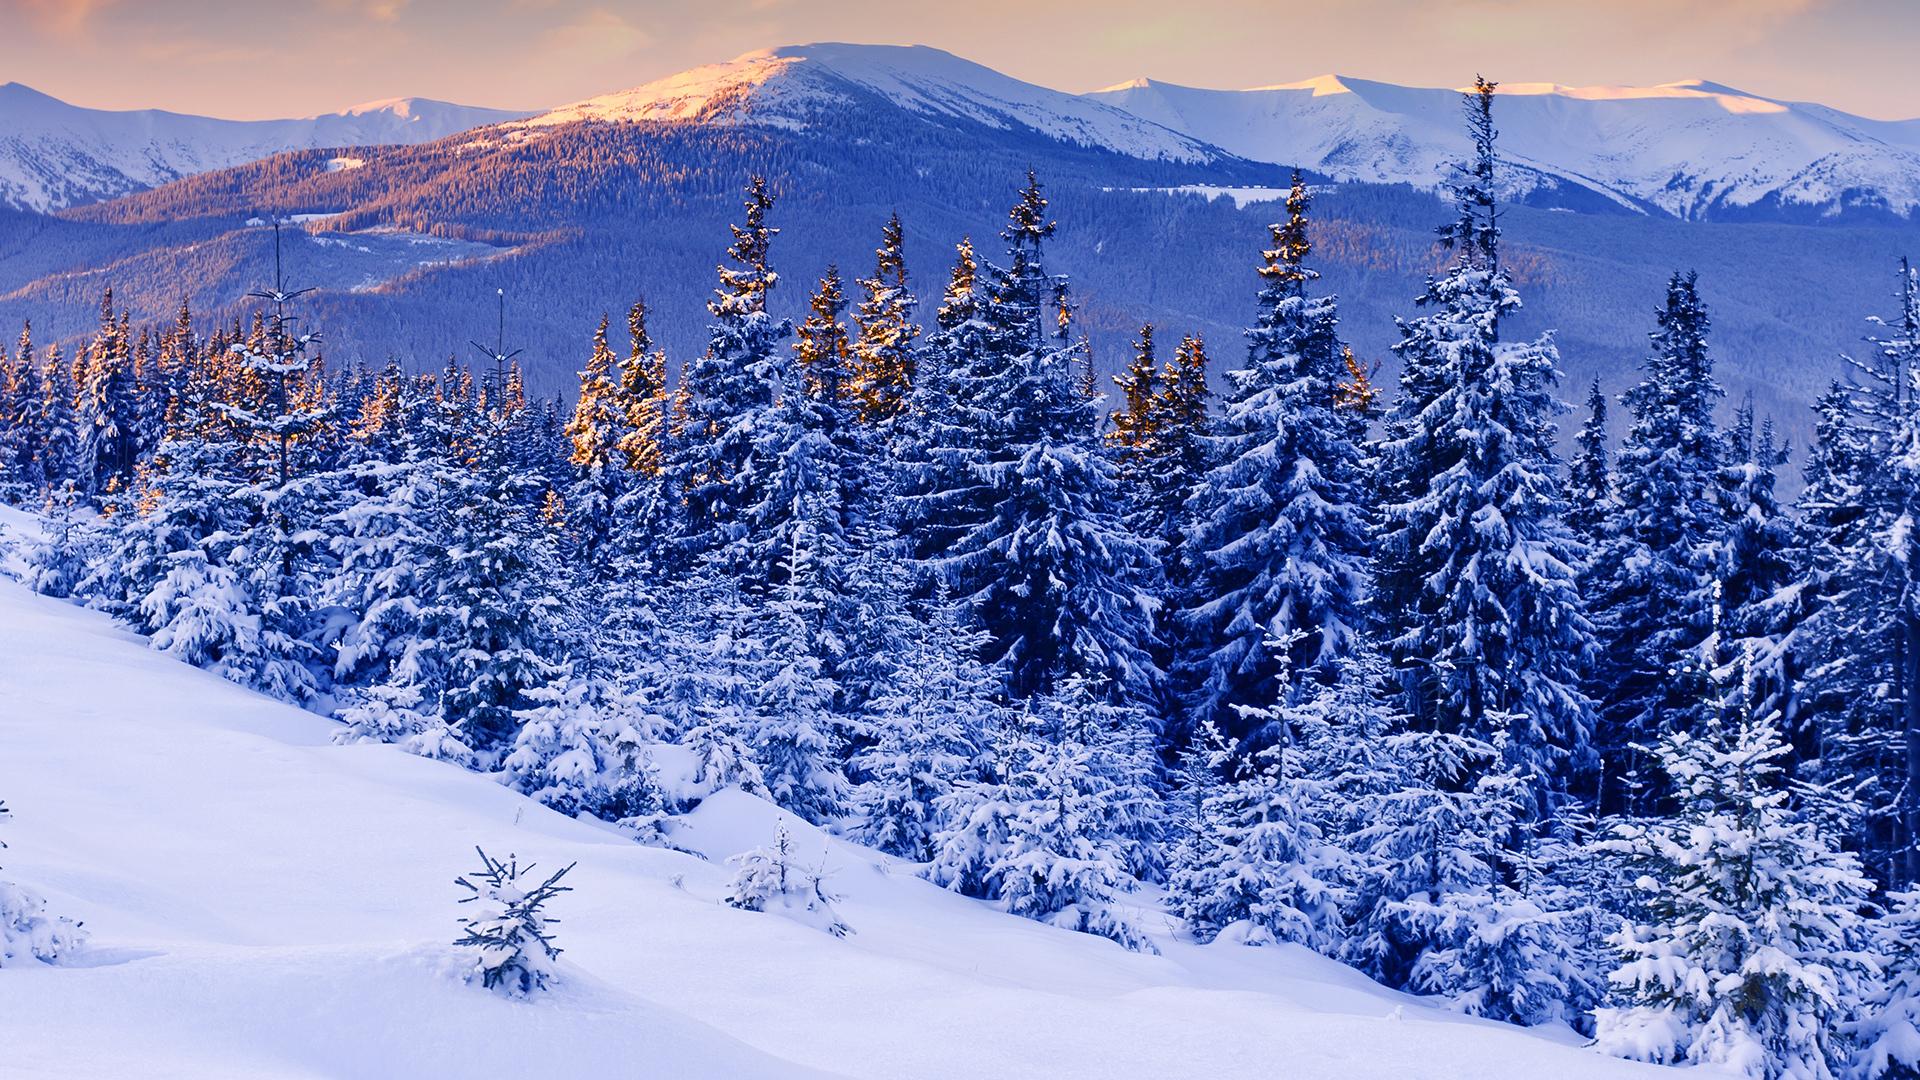 снег ели гора snow ate mountain  № 2479270 без смс